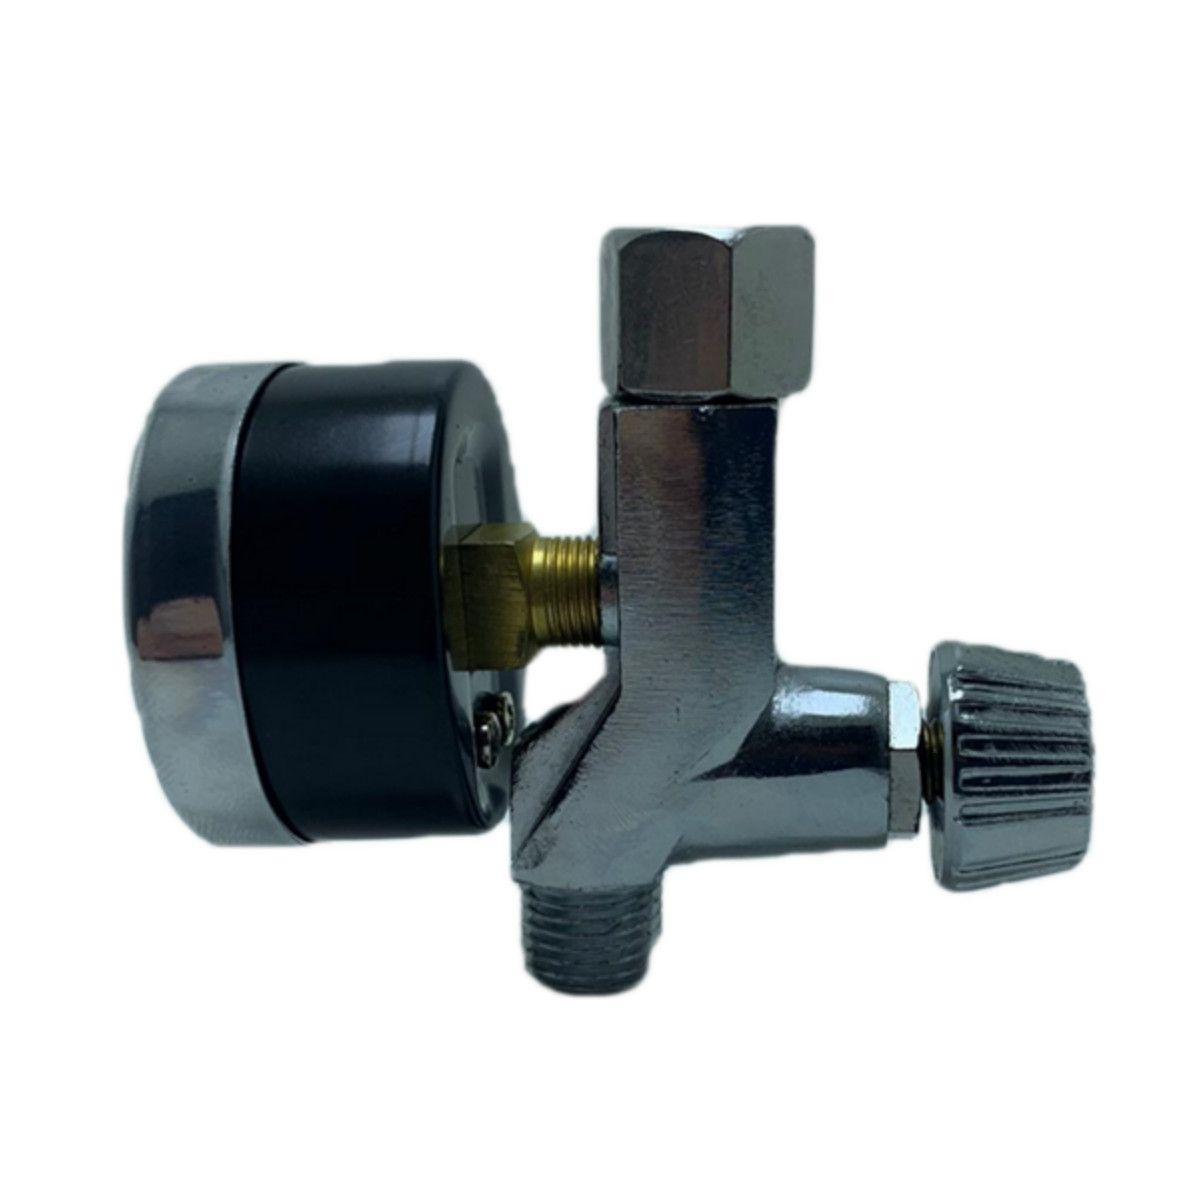 Kit 3 Regulador de Válvula Pressão Para Pistola De Pintura Manômetro